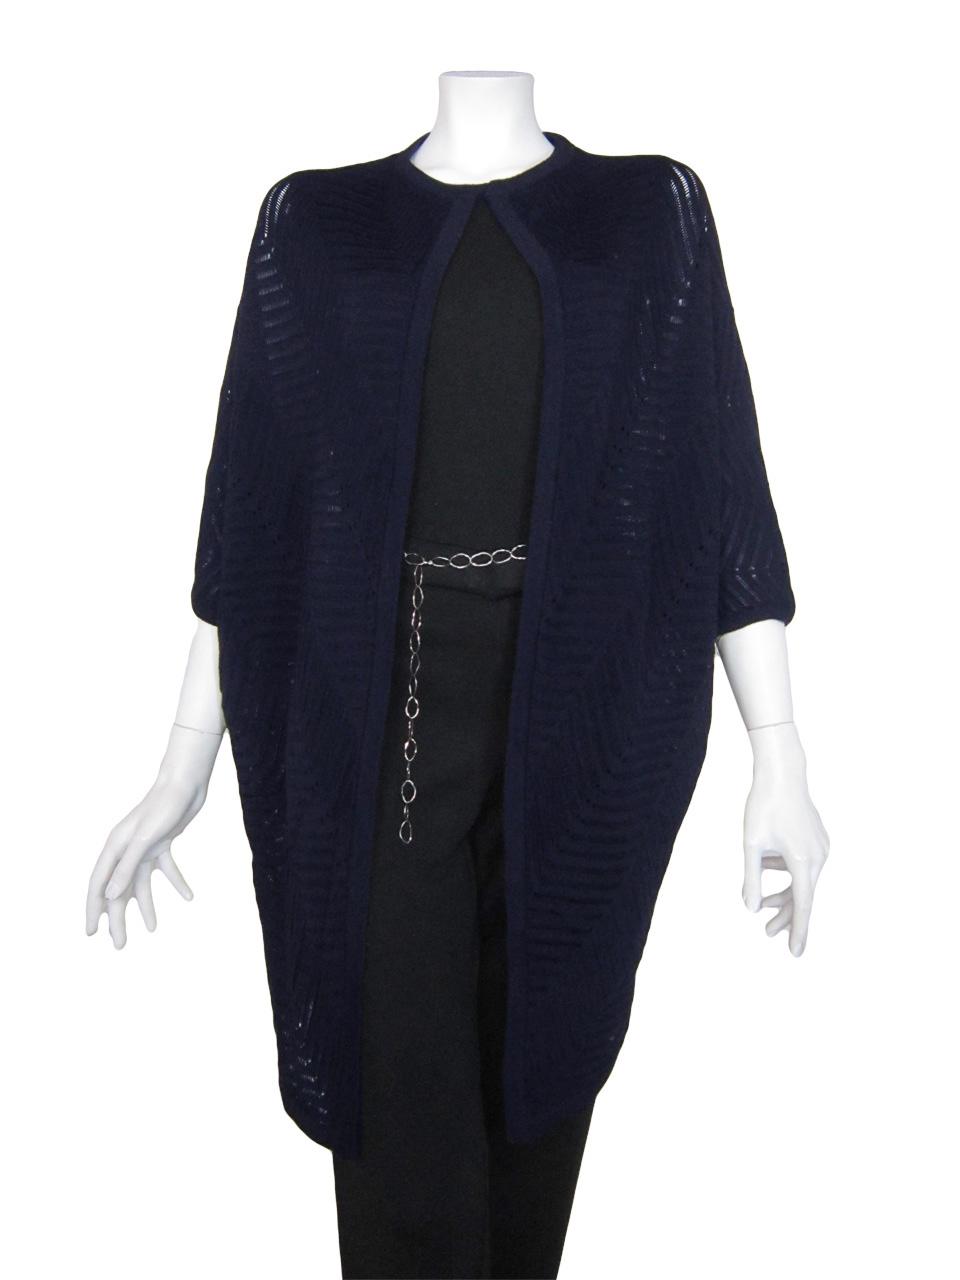 Kimono Jacket with Work 46 - Blue